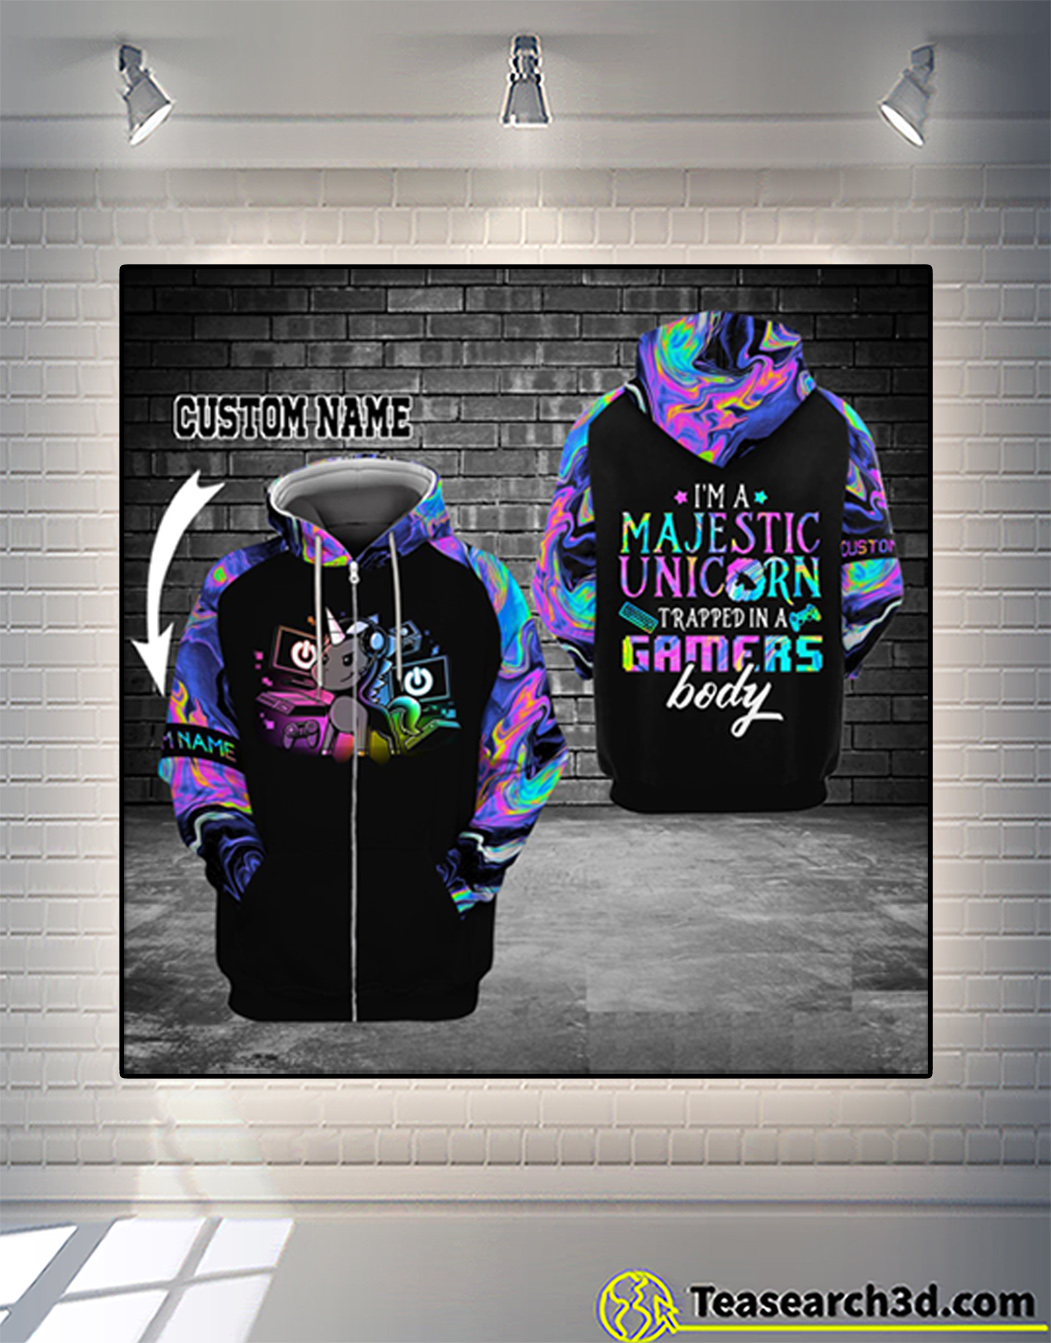 Personalized custom name gamer I'm a majestic unicorn 3d zip hoodie